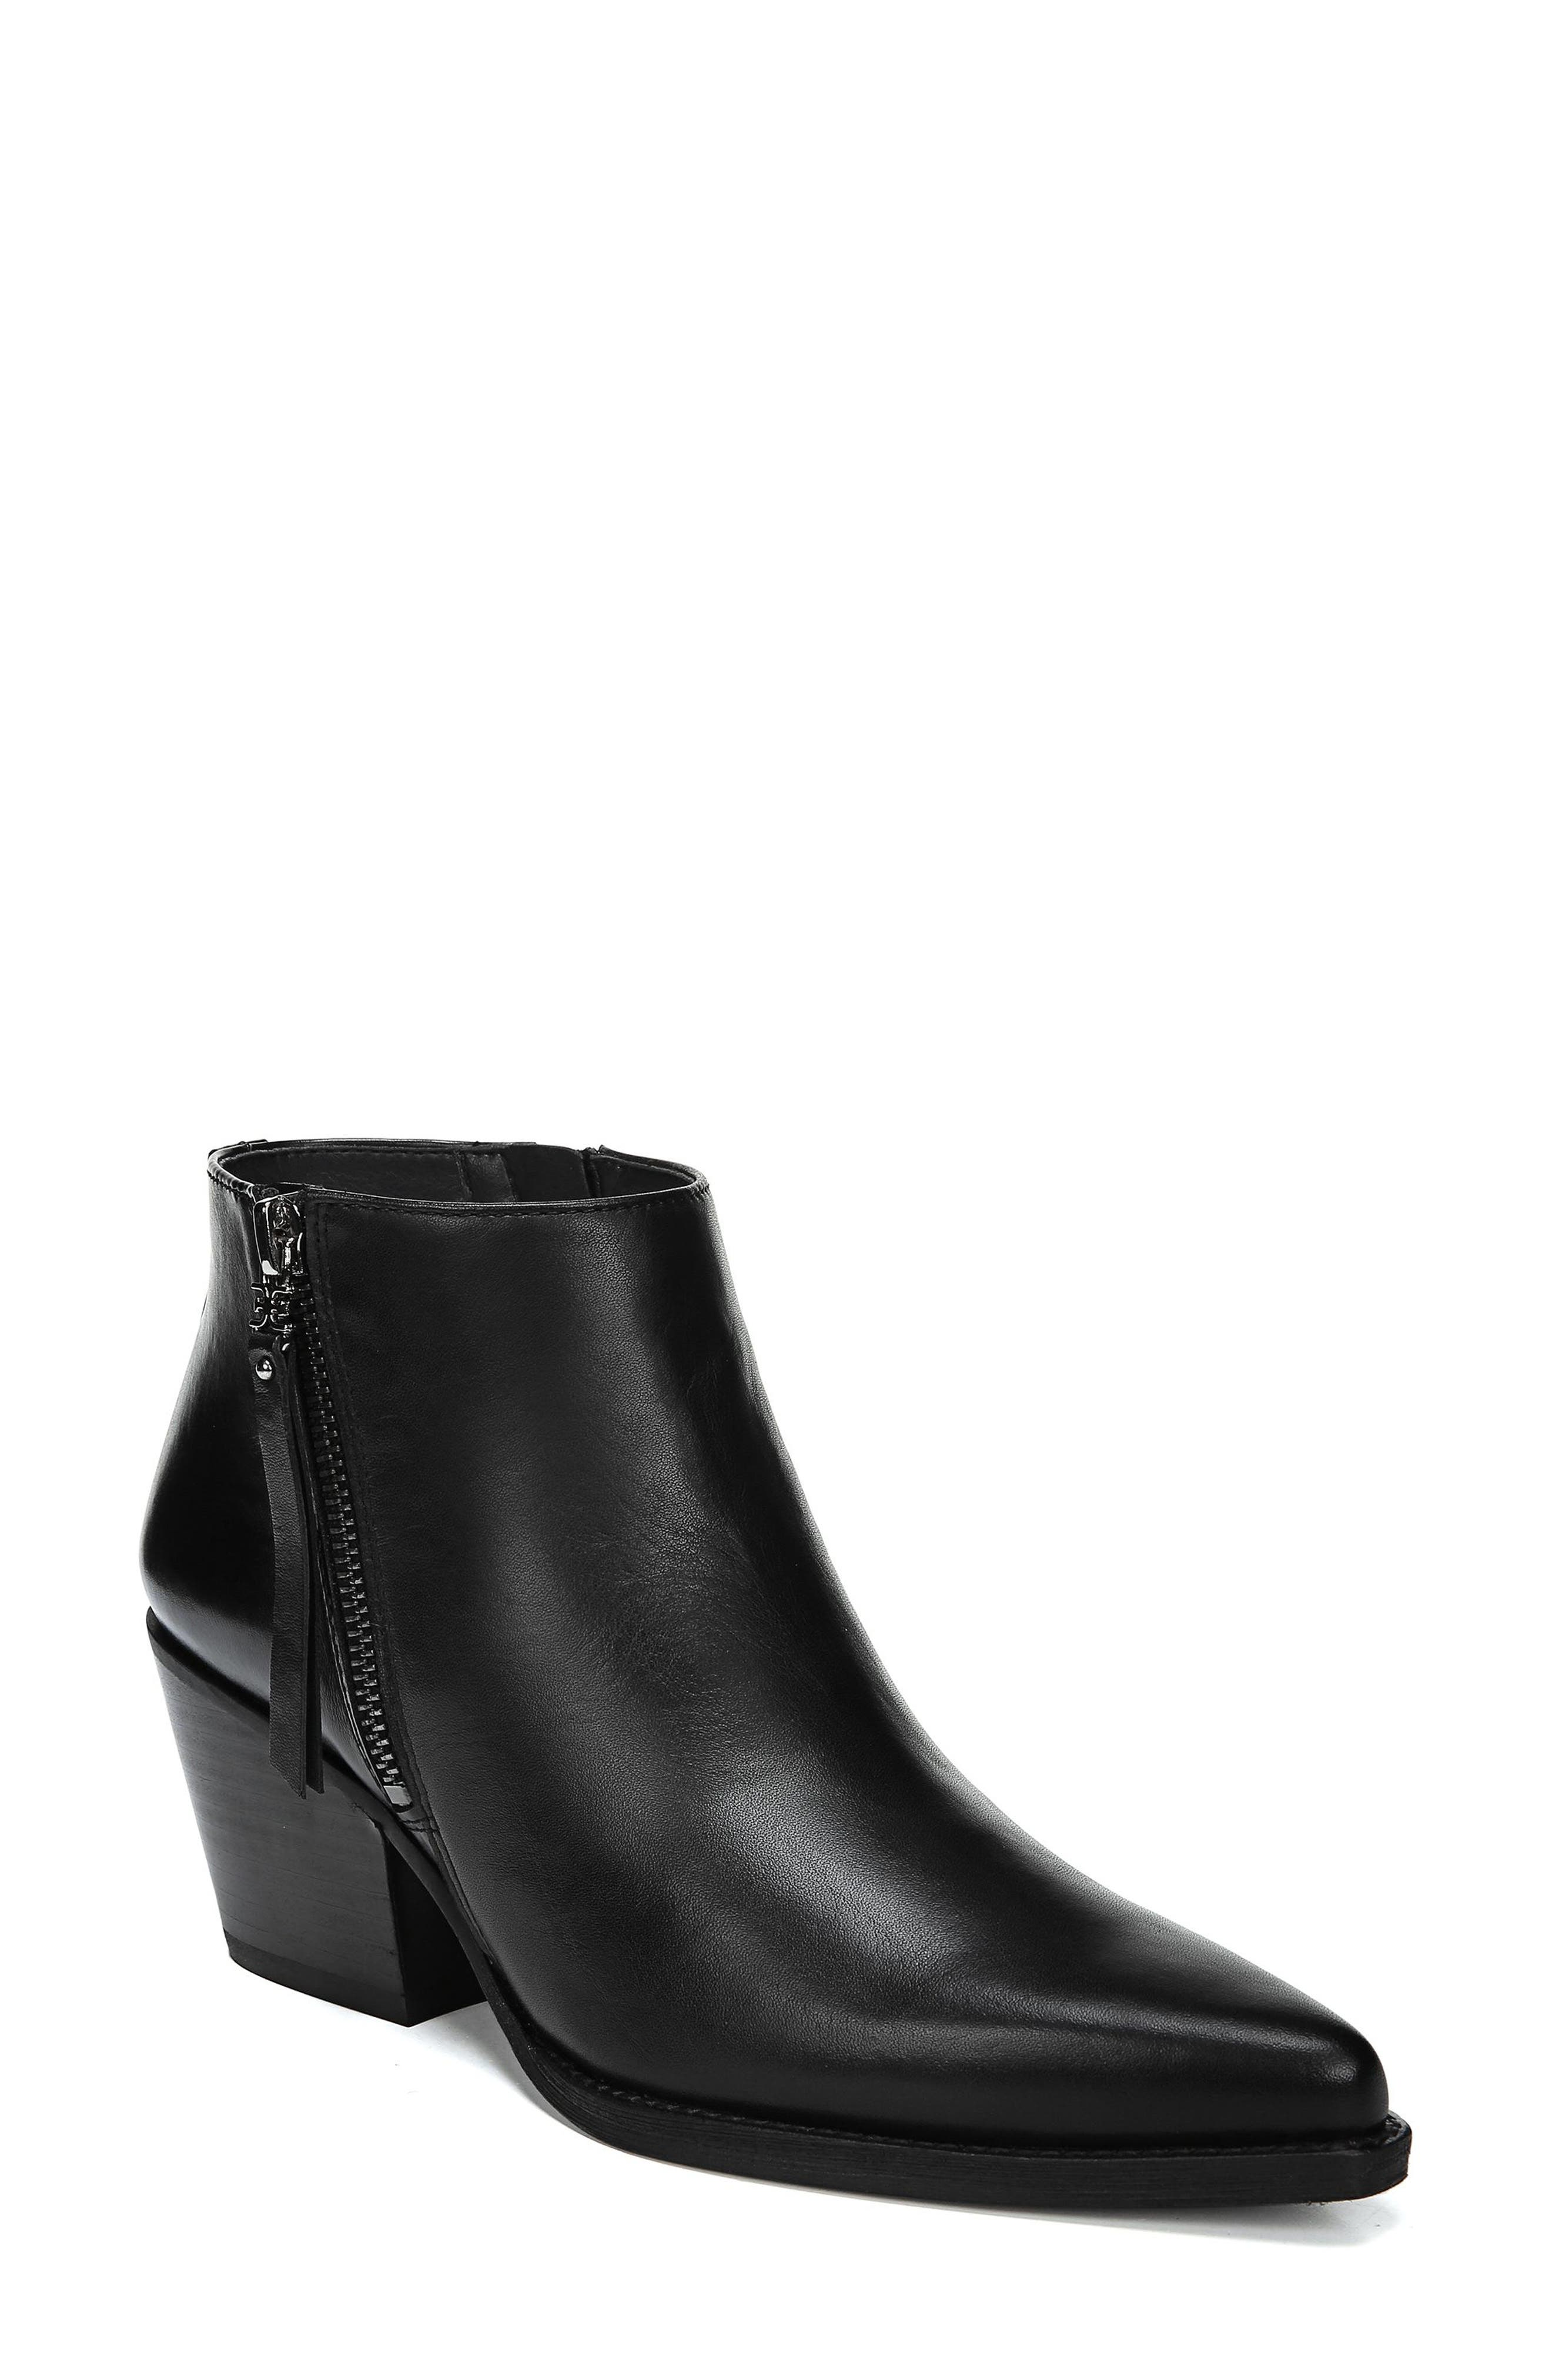 bc3ec0375 Women s Sam Edelman Booties   Ankle Boots